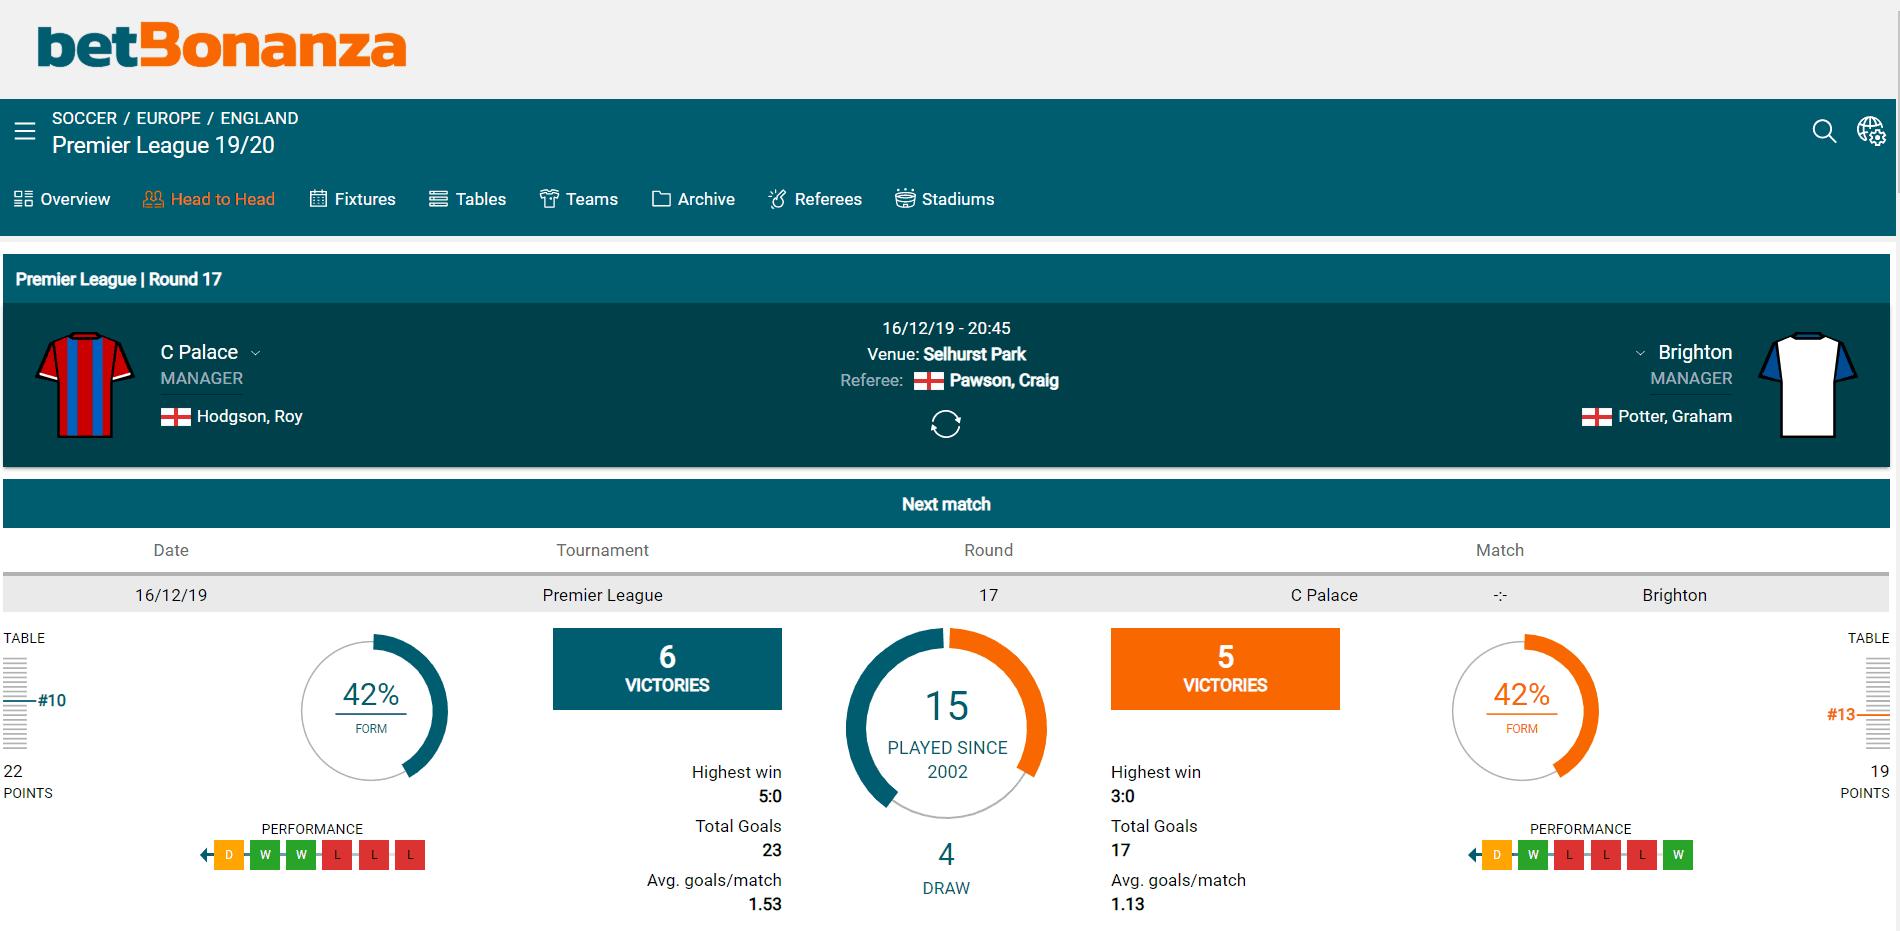 Betbonanza match statistics